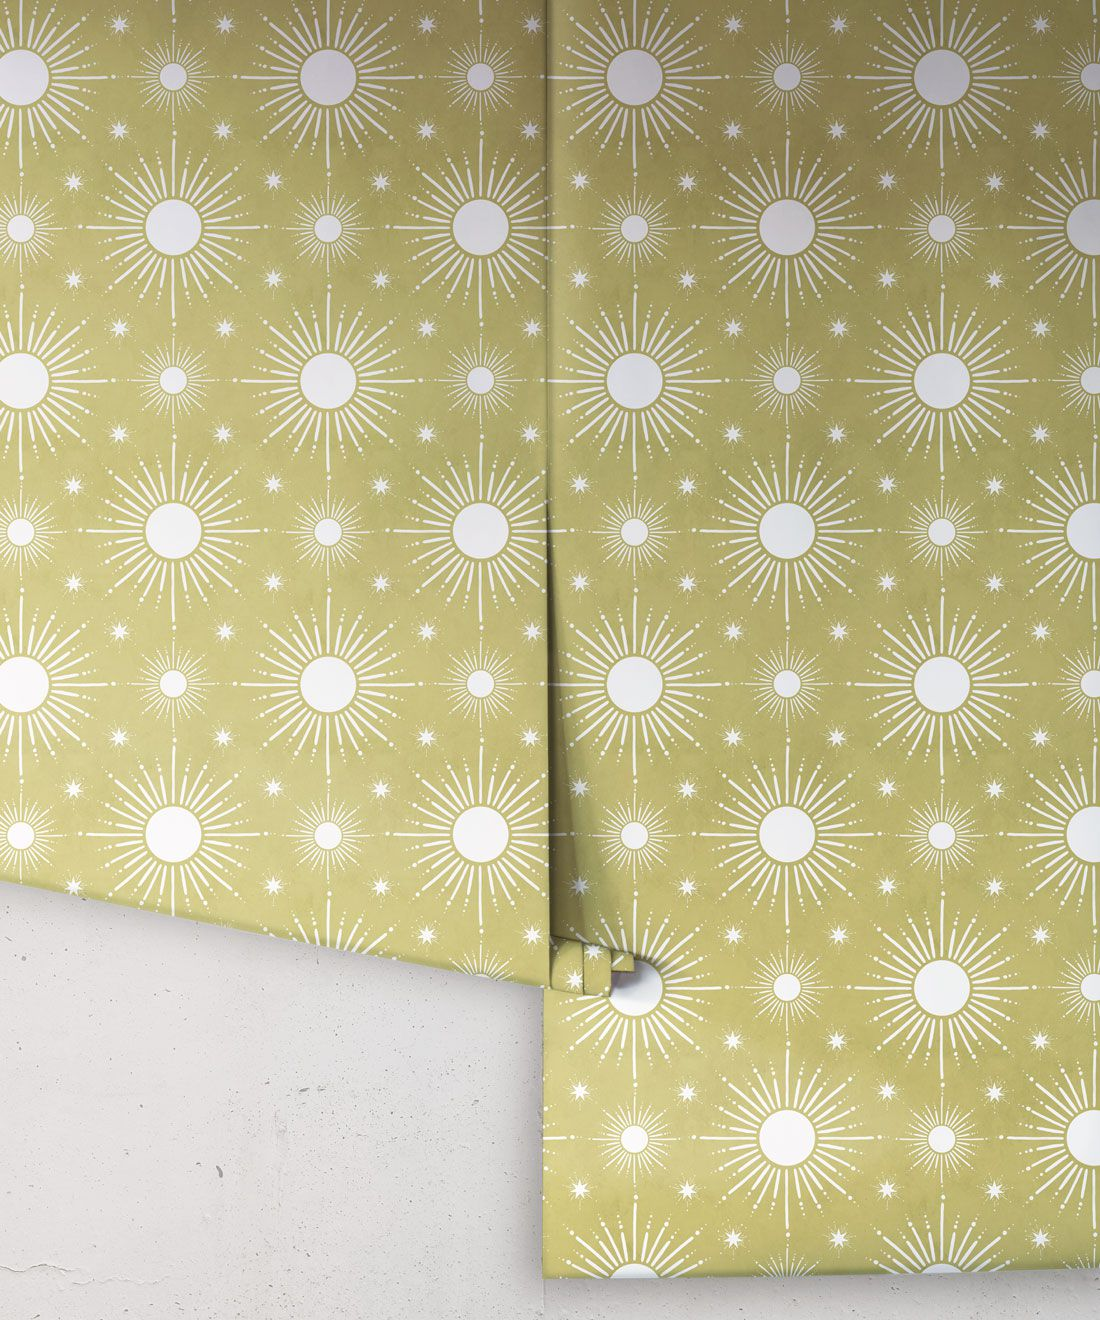 Sun Light Star Bright Wallpaper • Chartreuse • Rolls